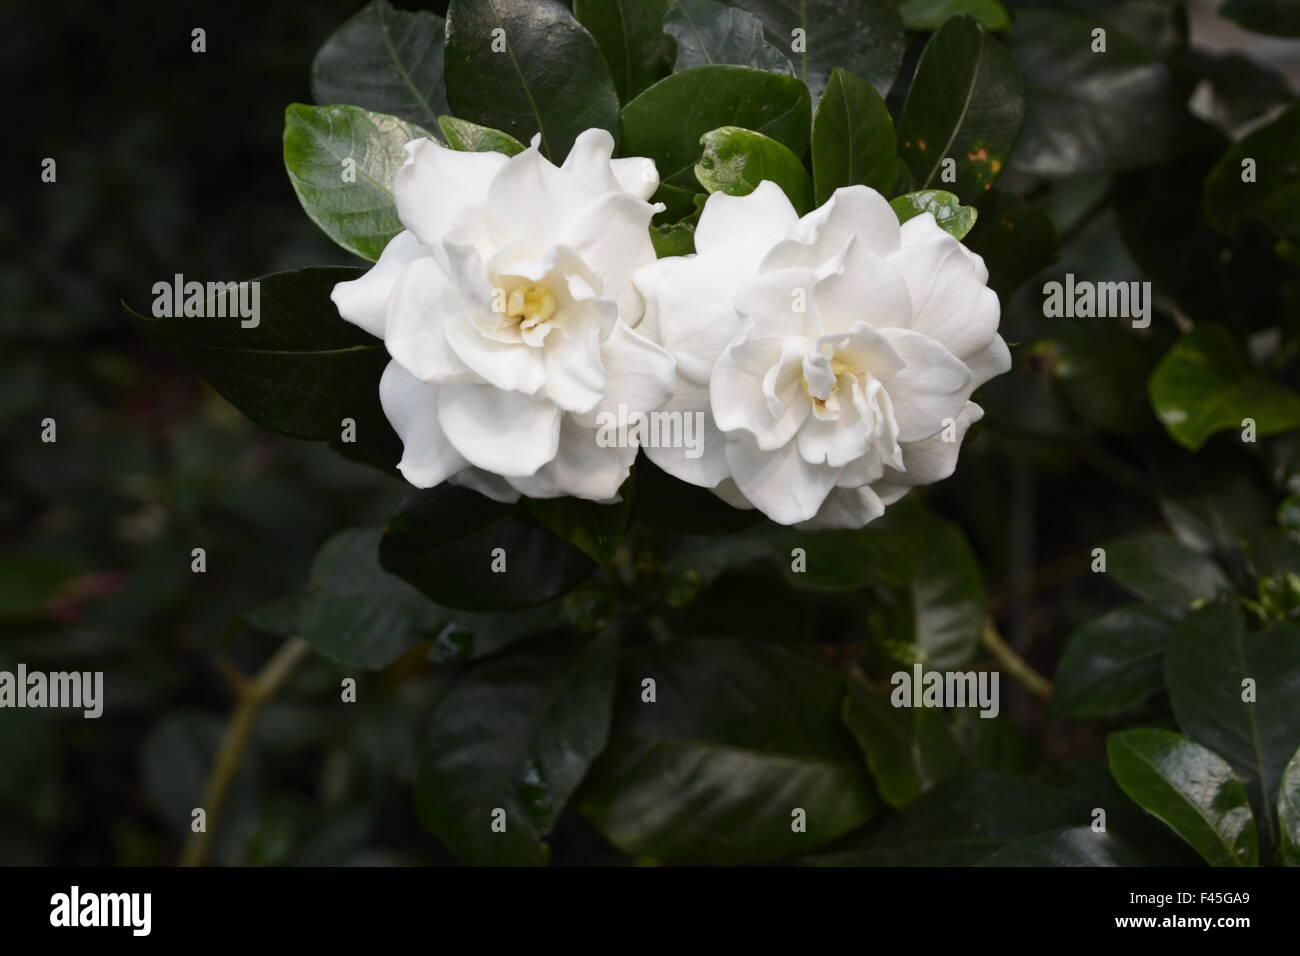 White Gardenia Flower Stock Photo 88633057 Alamy